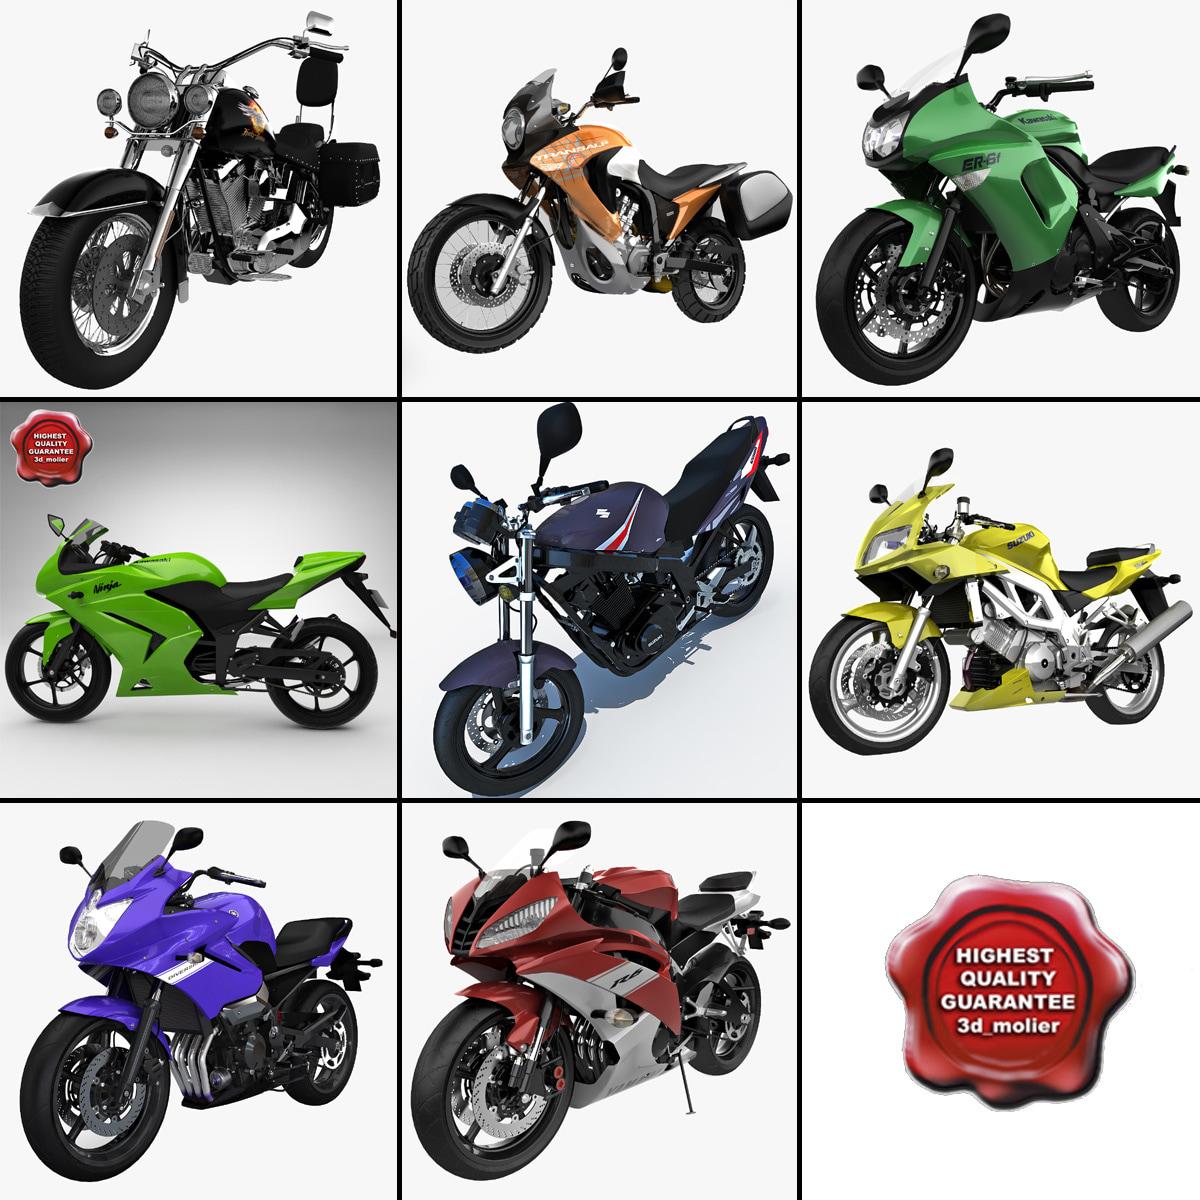 Moto Collection 13 copy.jpg